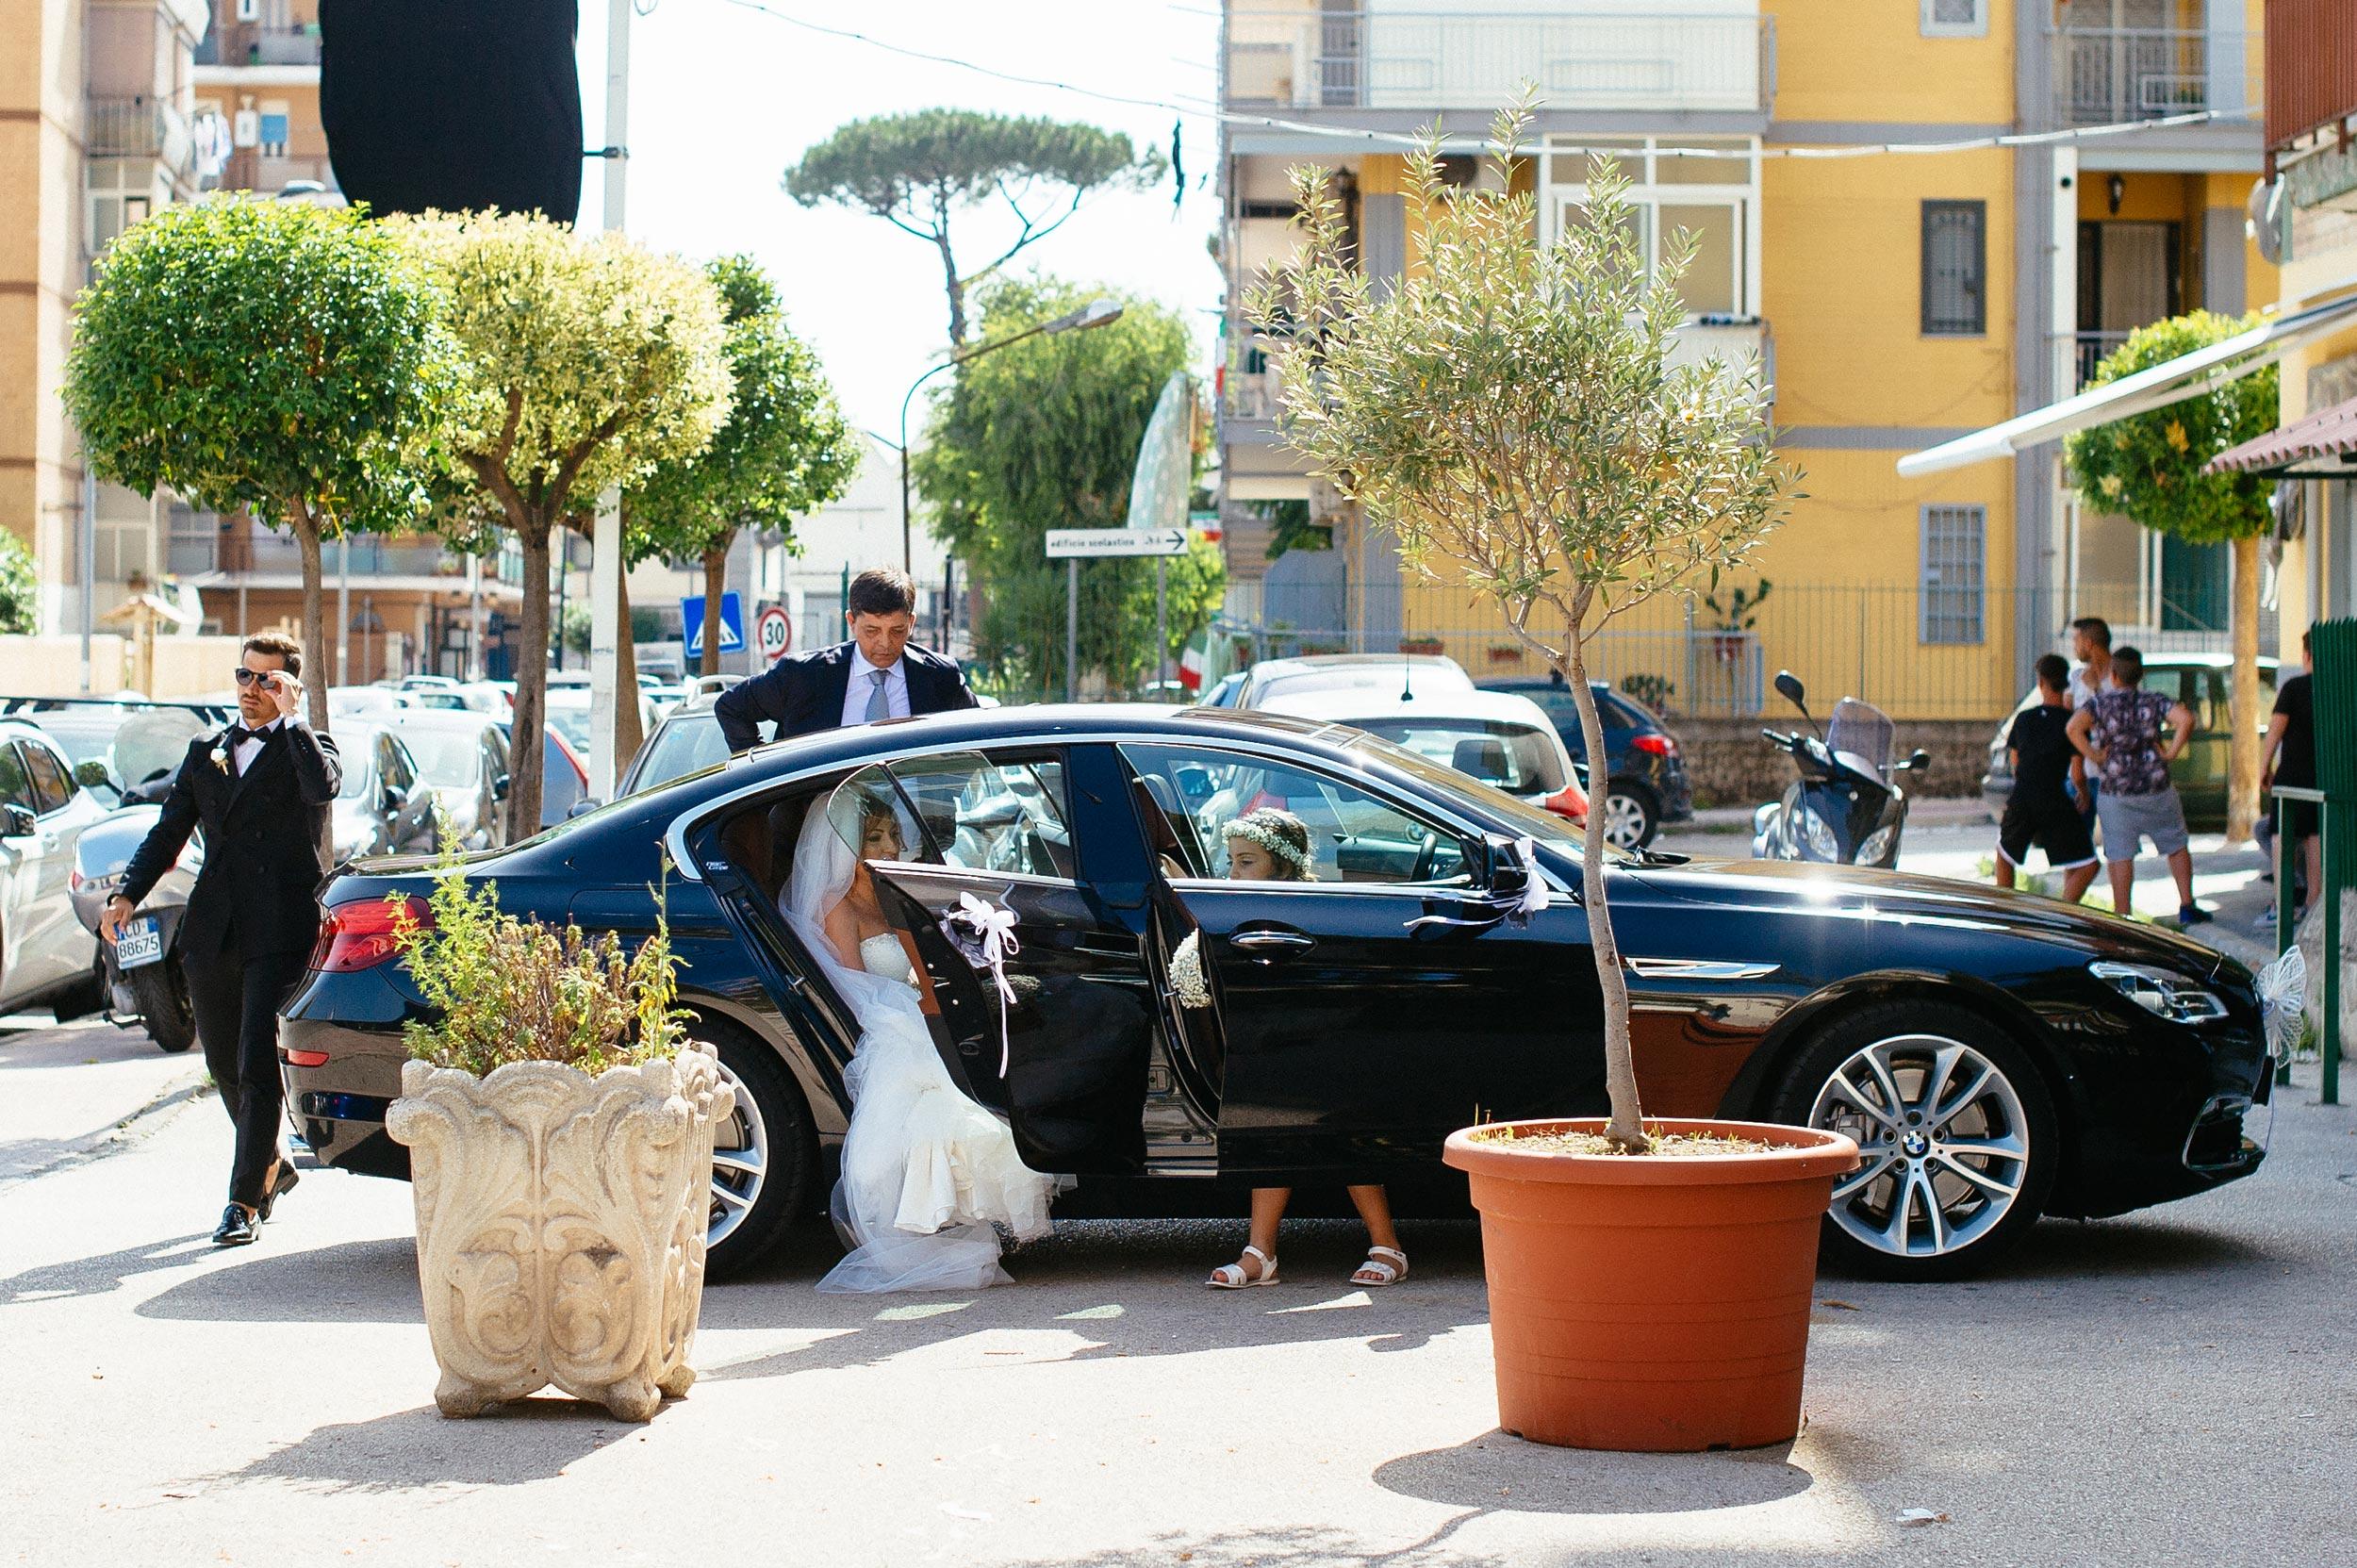 2016-Claudio-Teresa-Naples-Wedding-Photographer-Italy-Alessandro-Avenali-38.jpg